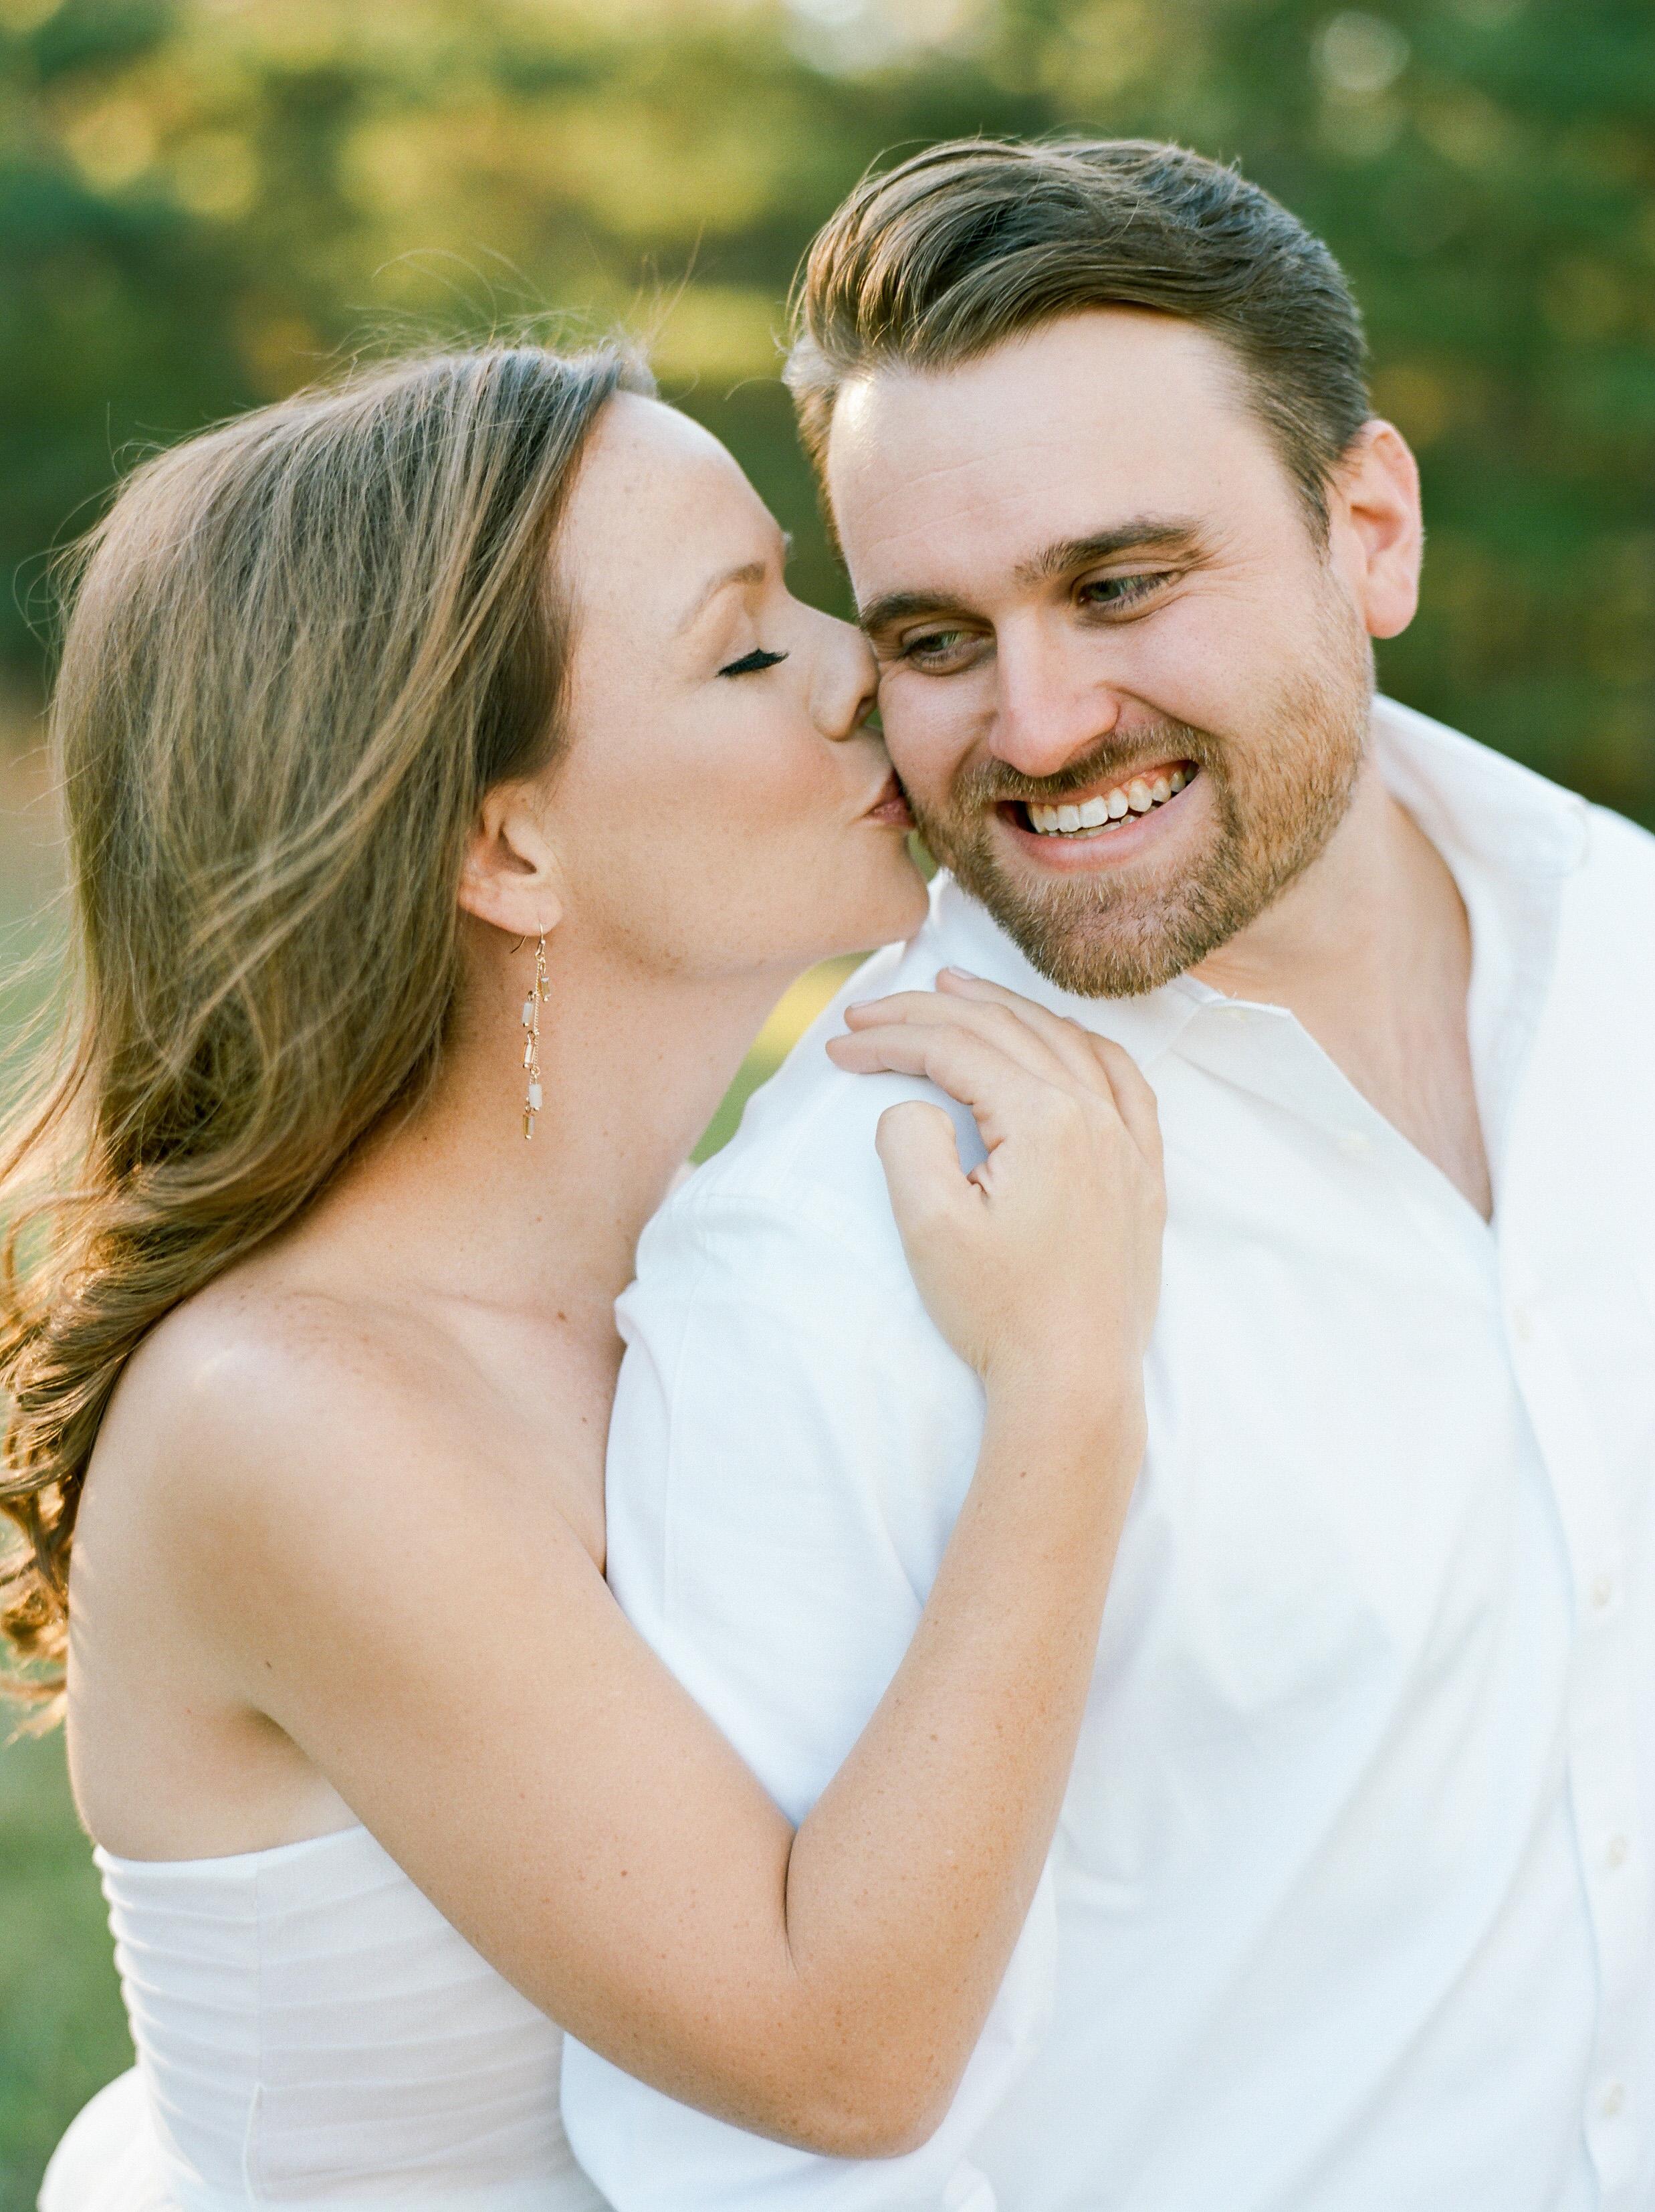 dana-fernandez-photography-houston-wedding-photographer-portraits-engagements-anniversary-session-film-photographer-austin-wedding-photographer-6.jpg